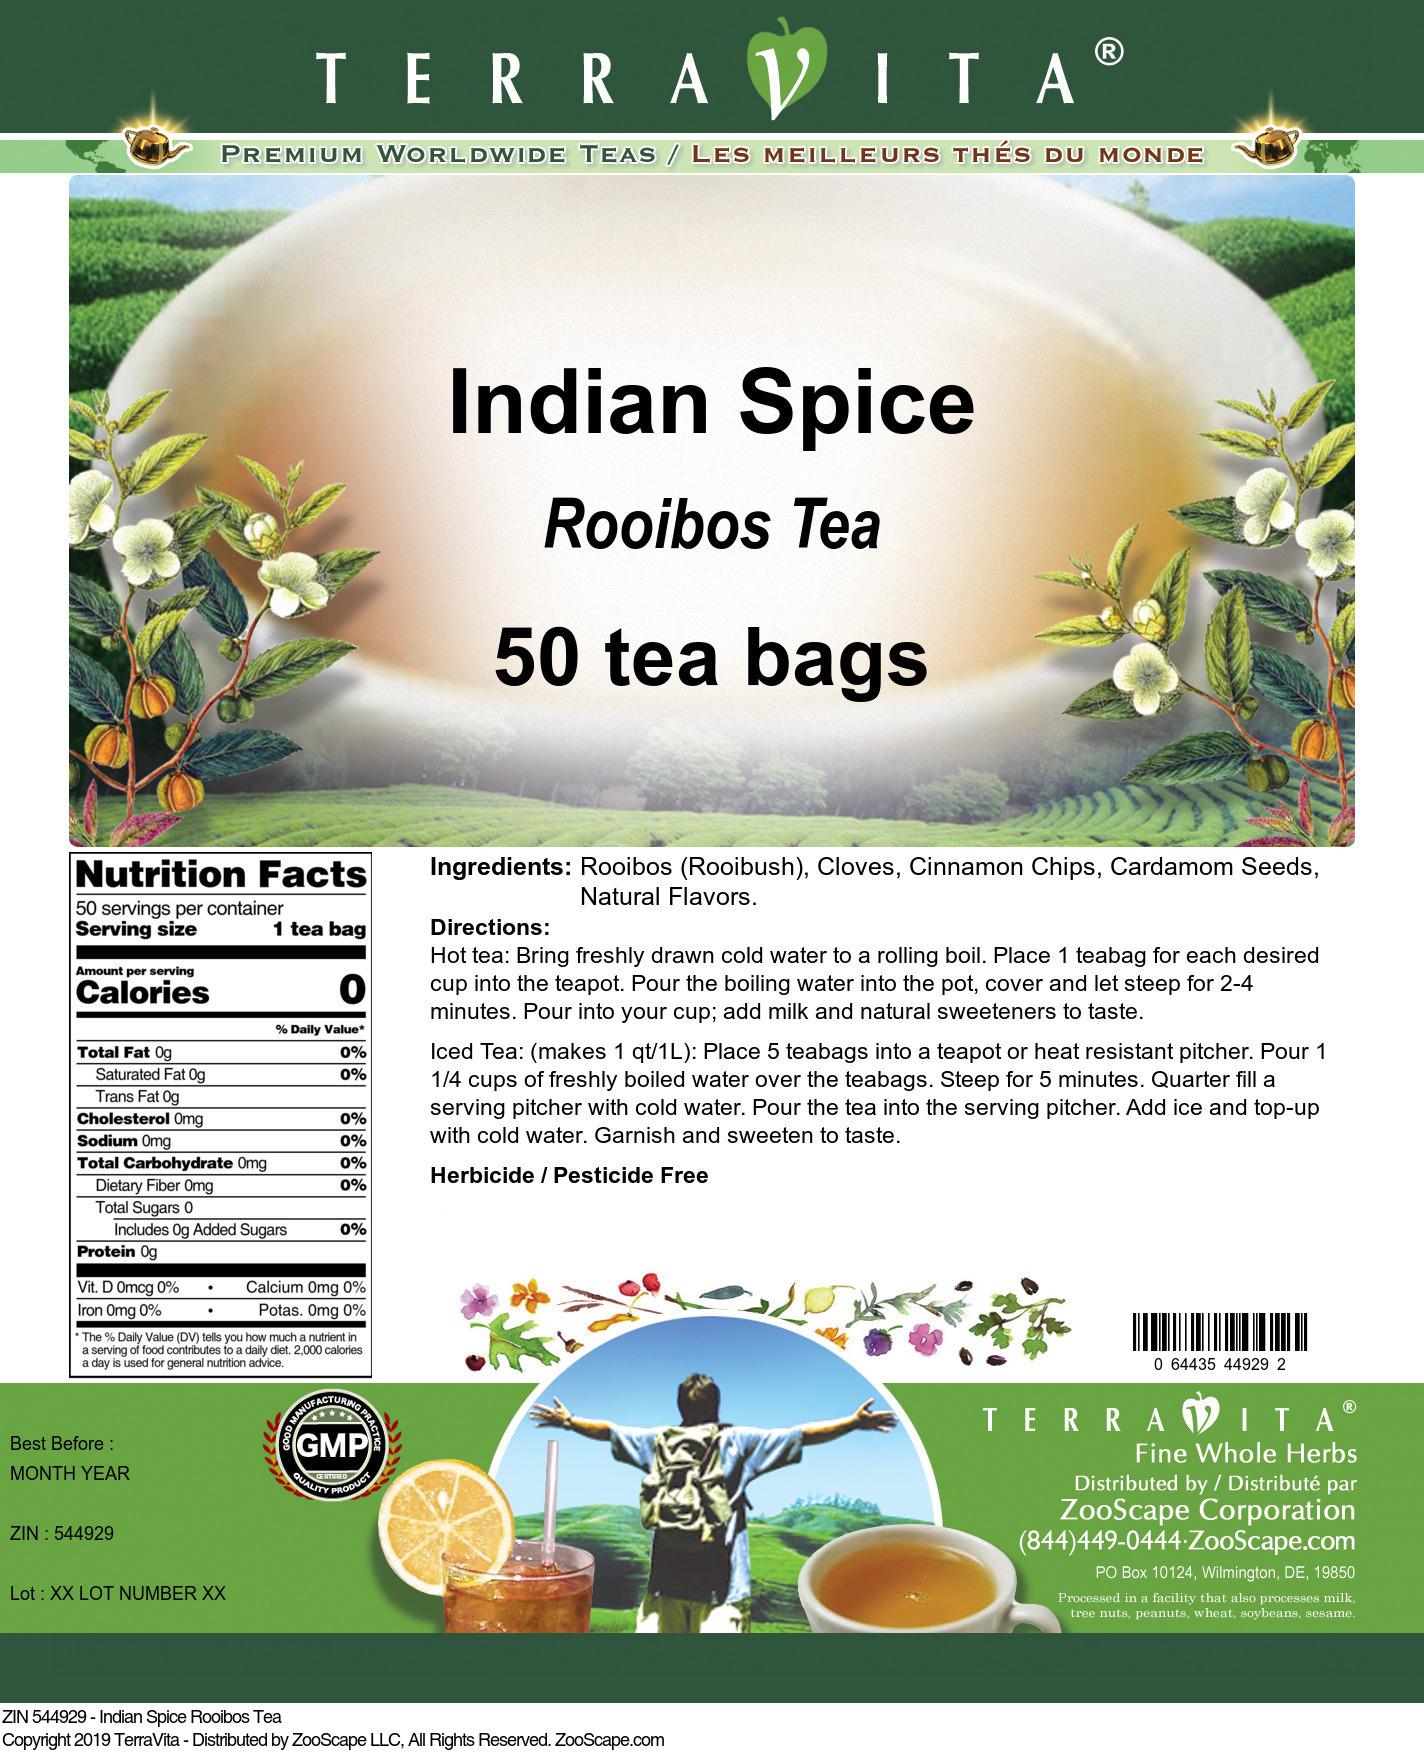 Indian Spice Rooibos Tea